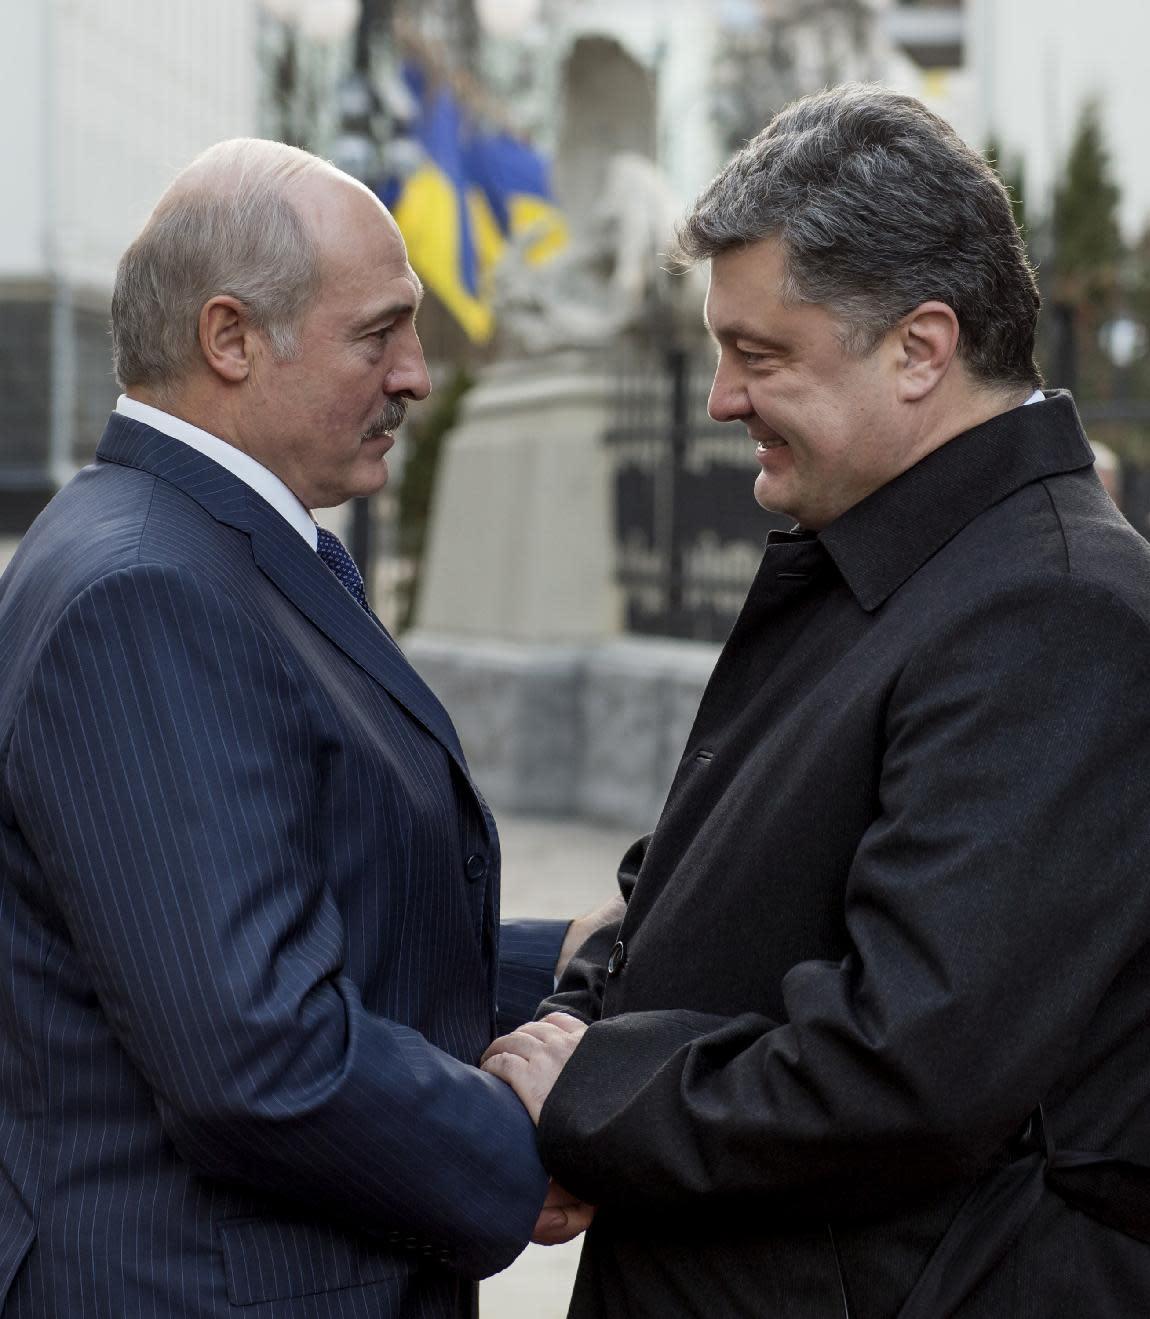 Ukrainian President Petro Poroshenko (right) greets his Belarussian counterpart Alexander Lukashenko for peace talks in Kiev, on December 21, 2014 (AFP Photo/Mykola Lazarenko)